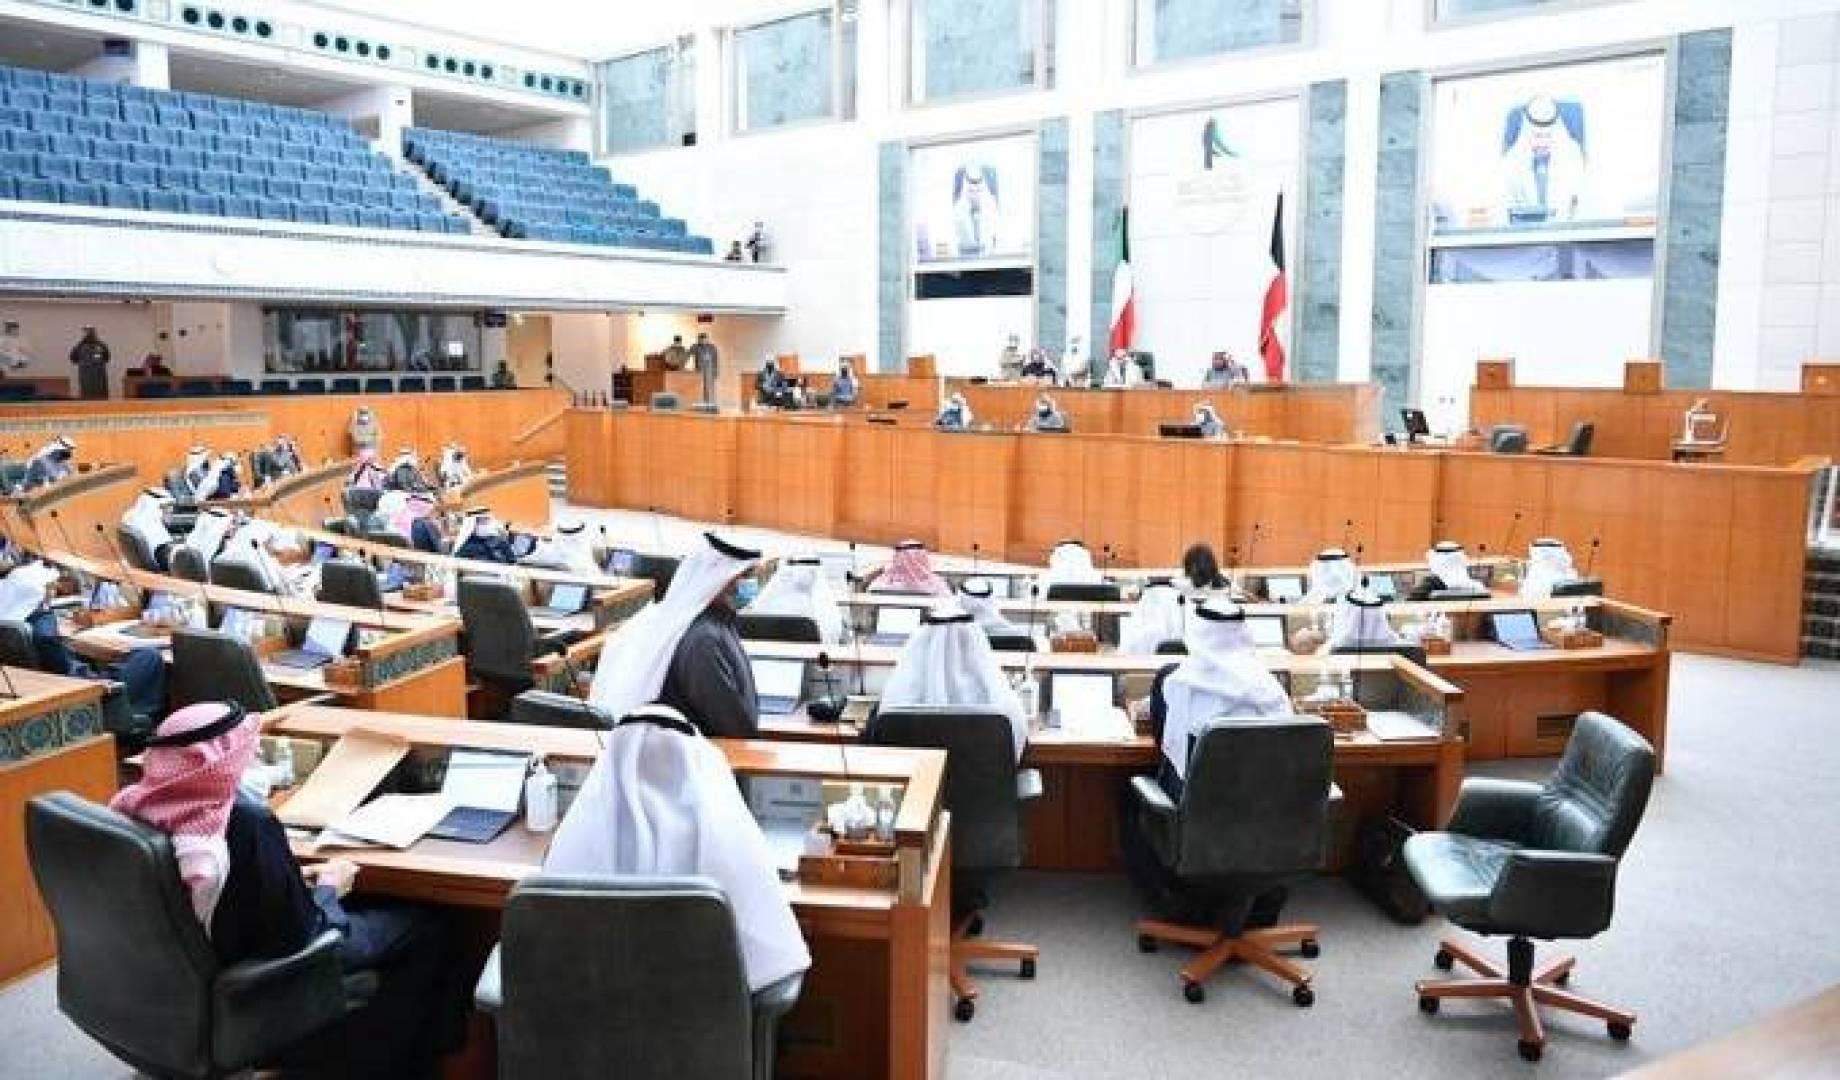 31 نائباً يؤيدون استجواب رئيس الوزراء